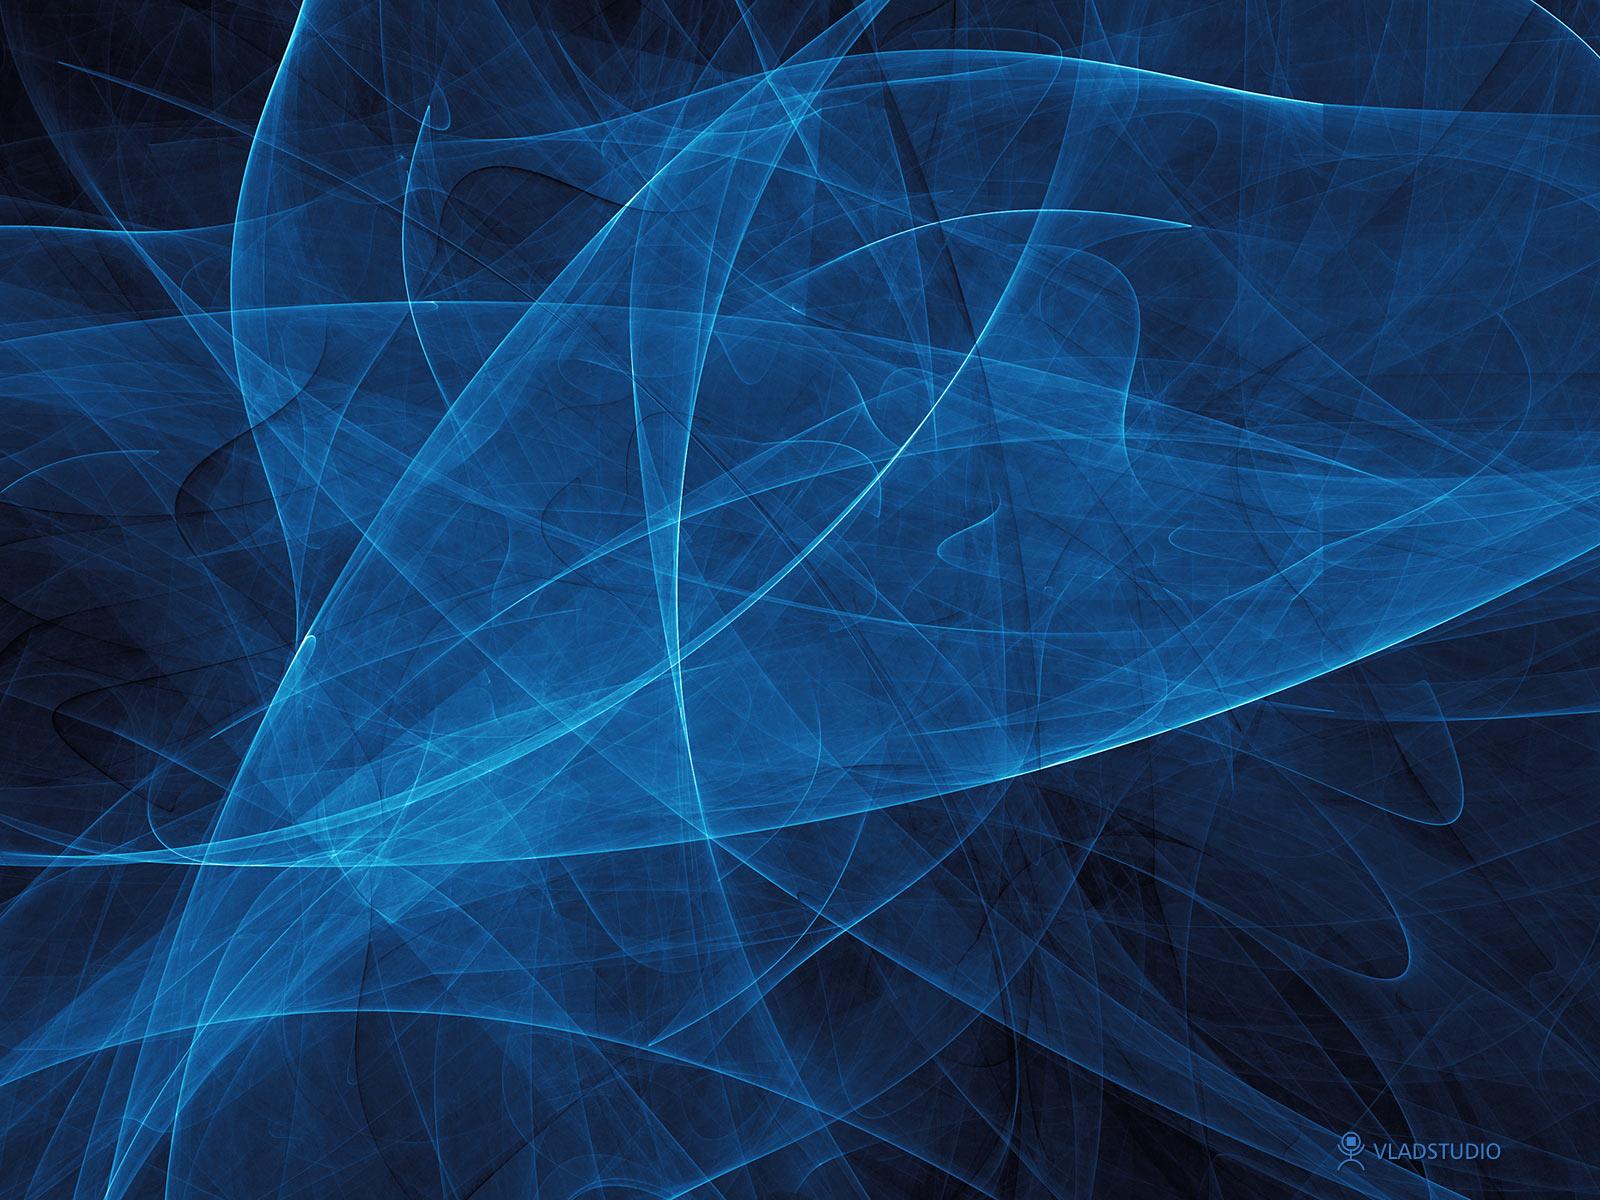 infinity 2 blue by vladstudio on deviantart